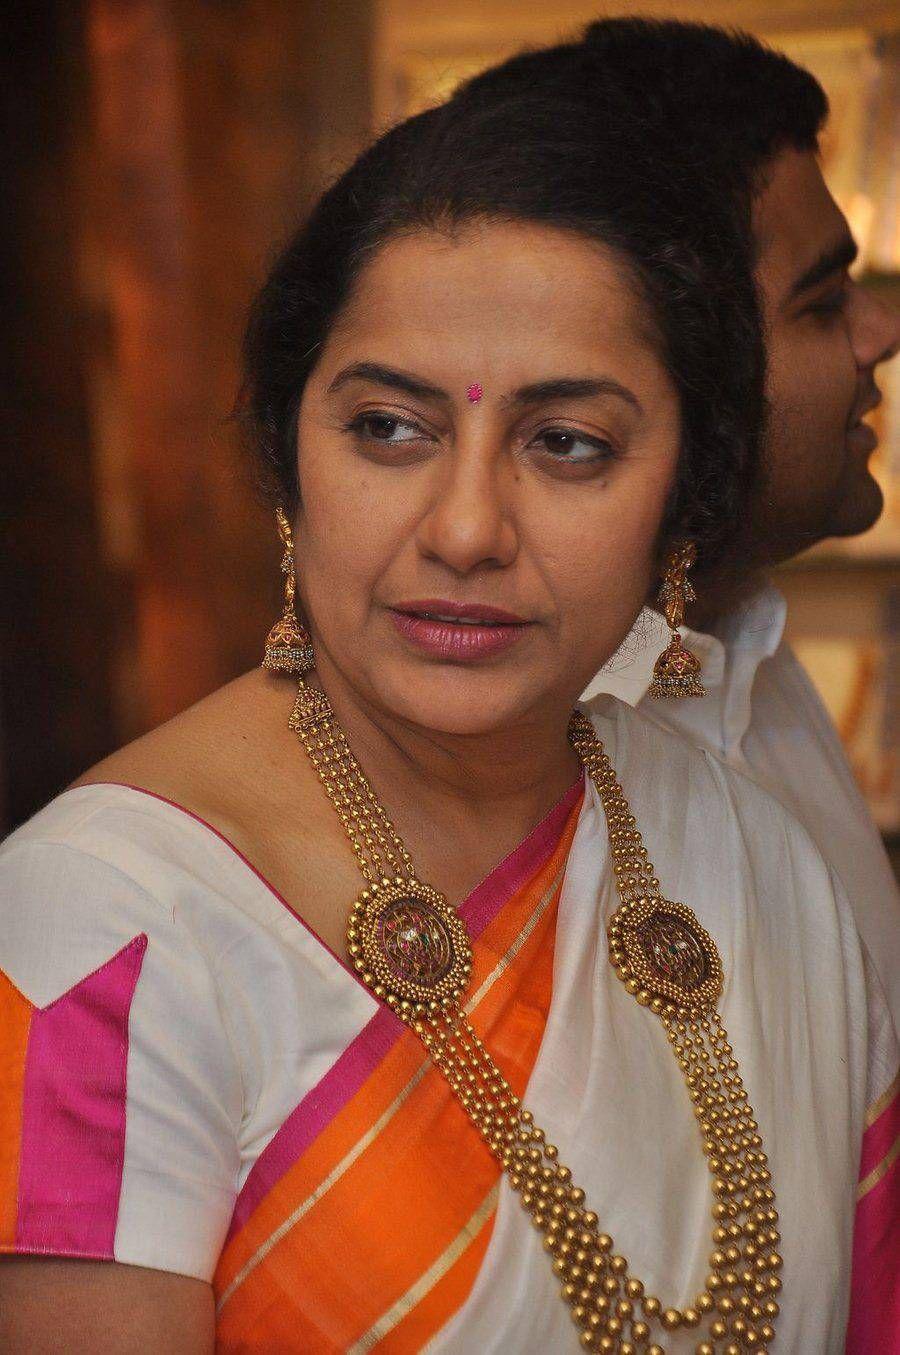 Suhasini in gundla haram jewellery designs - Actress Suhasini Latest Stills In White Saree